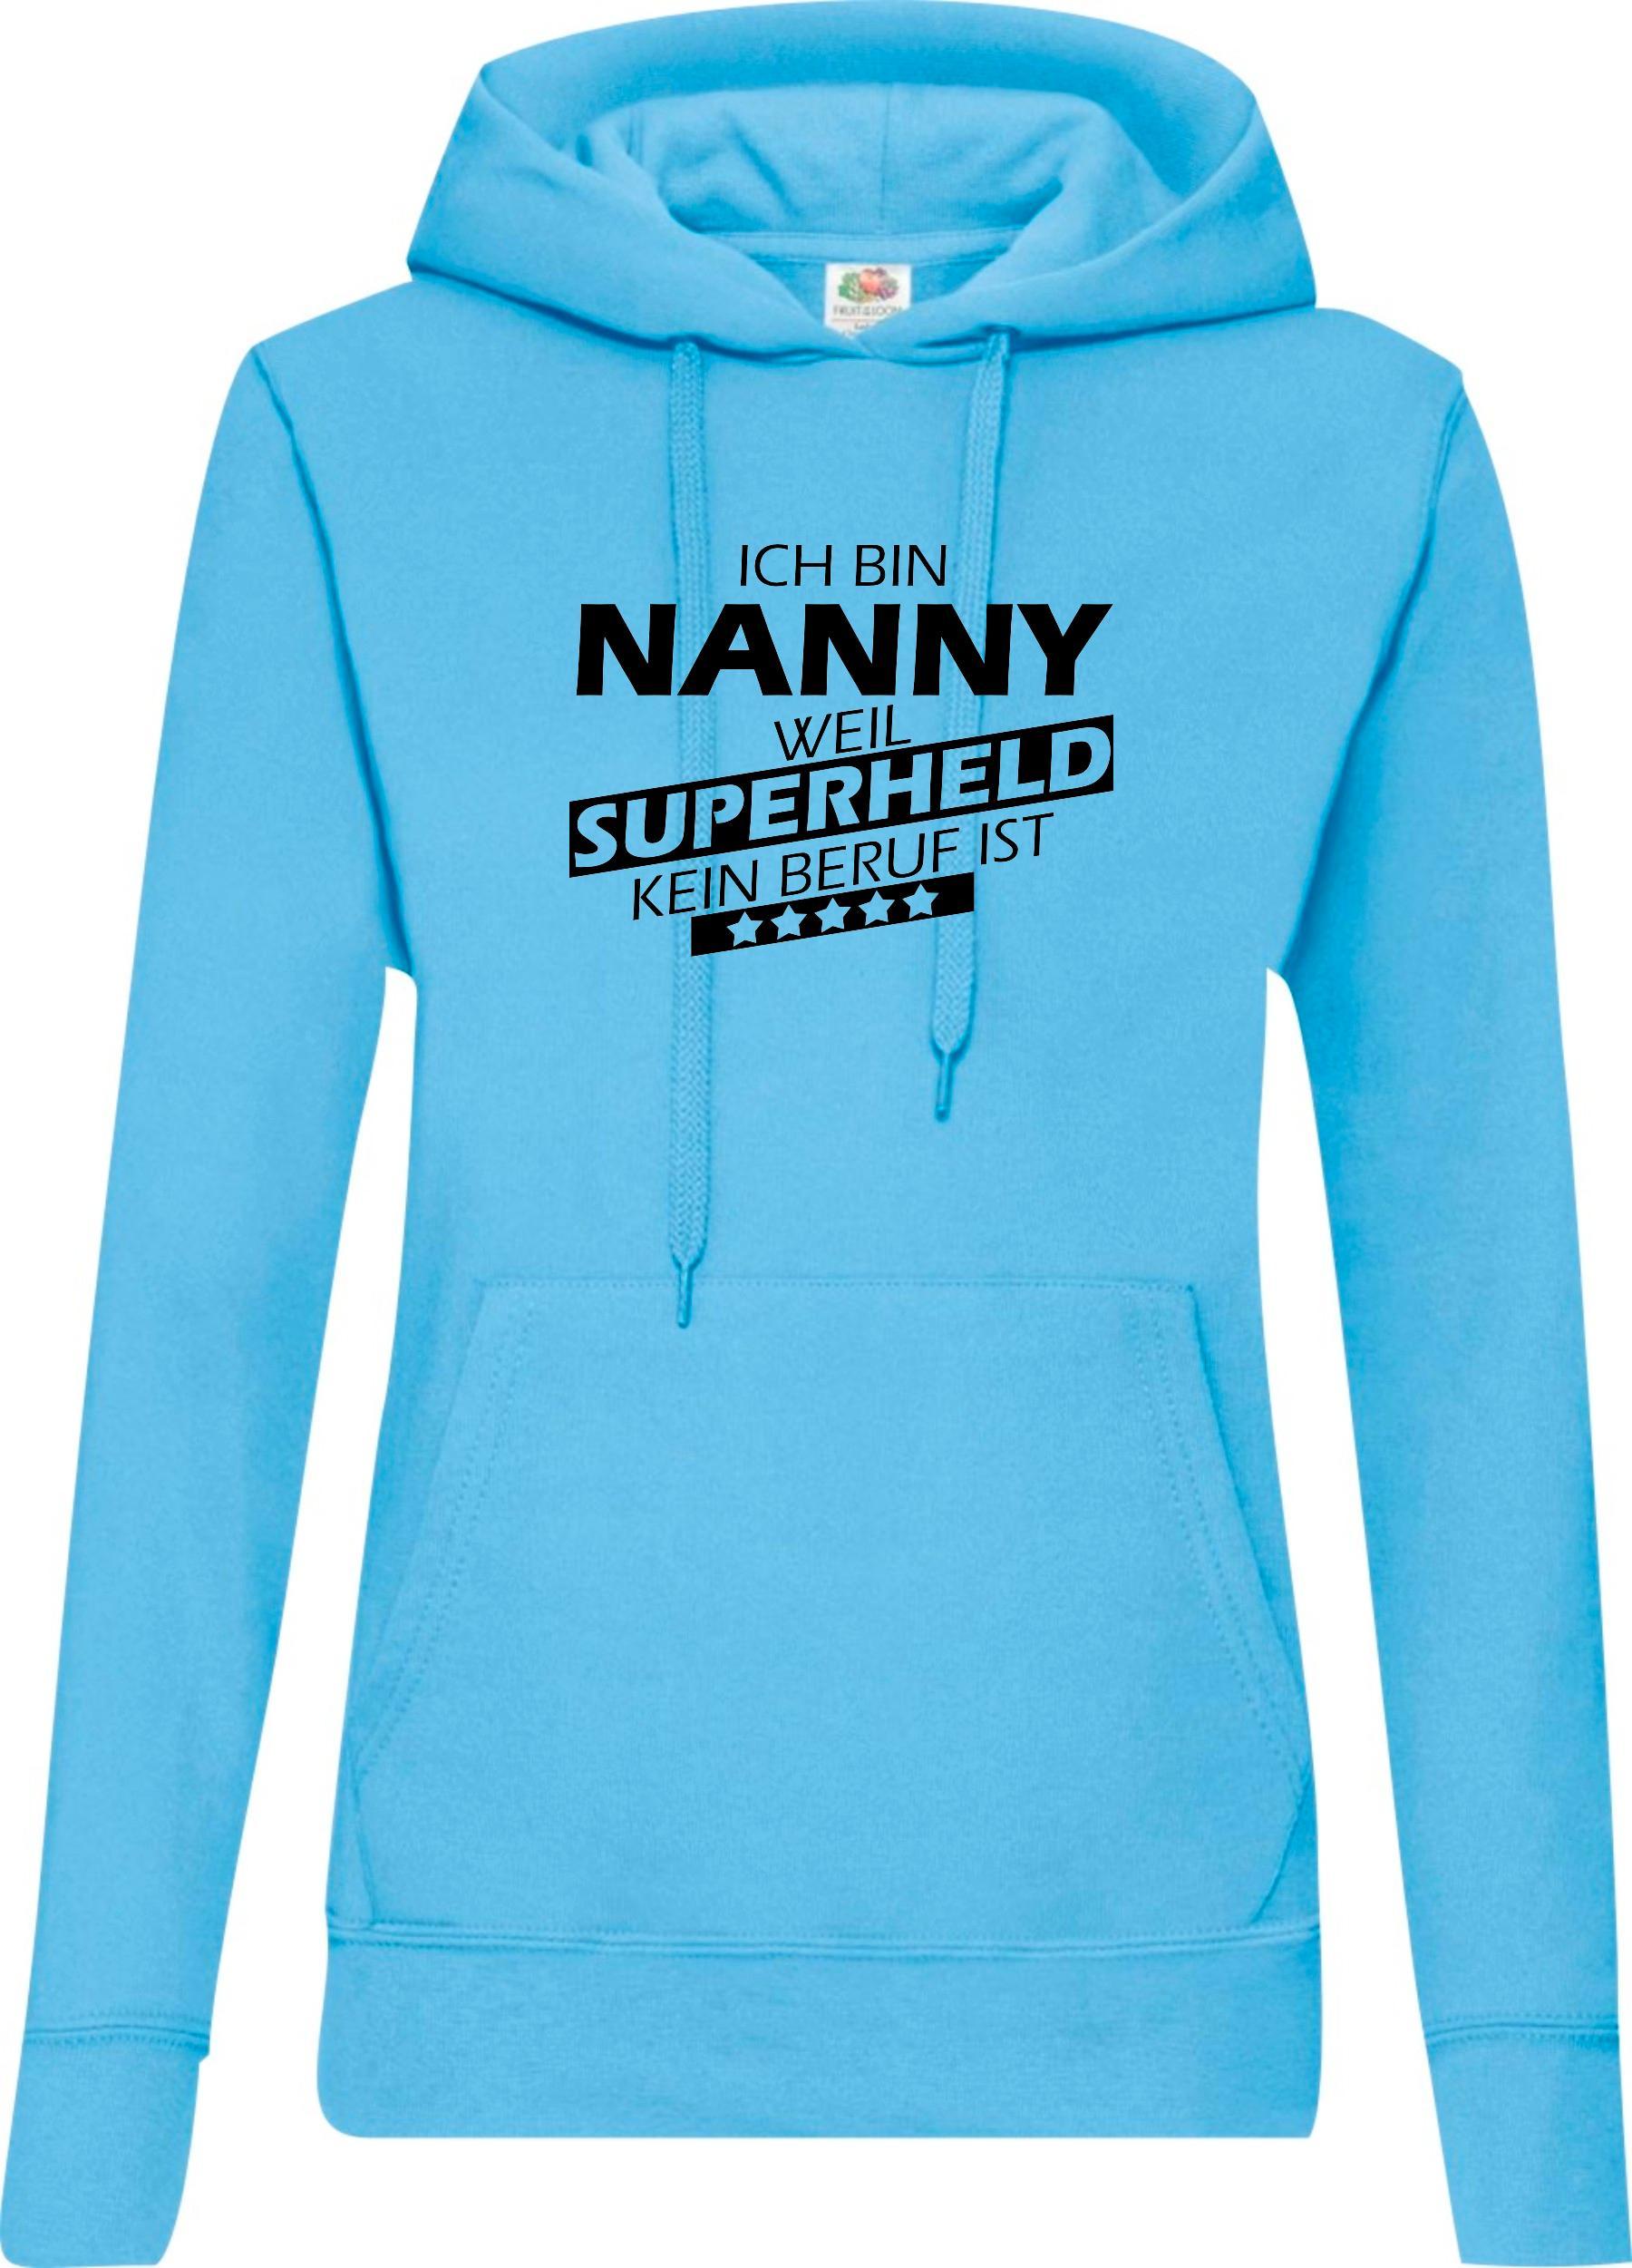 Lady-Kapuzensweatshirt-Ich-bin-Nanny-weil-Superheld-kein-Beruf-ist-Groessen-XS-X